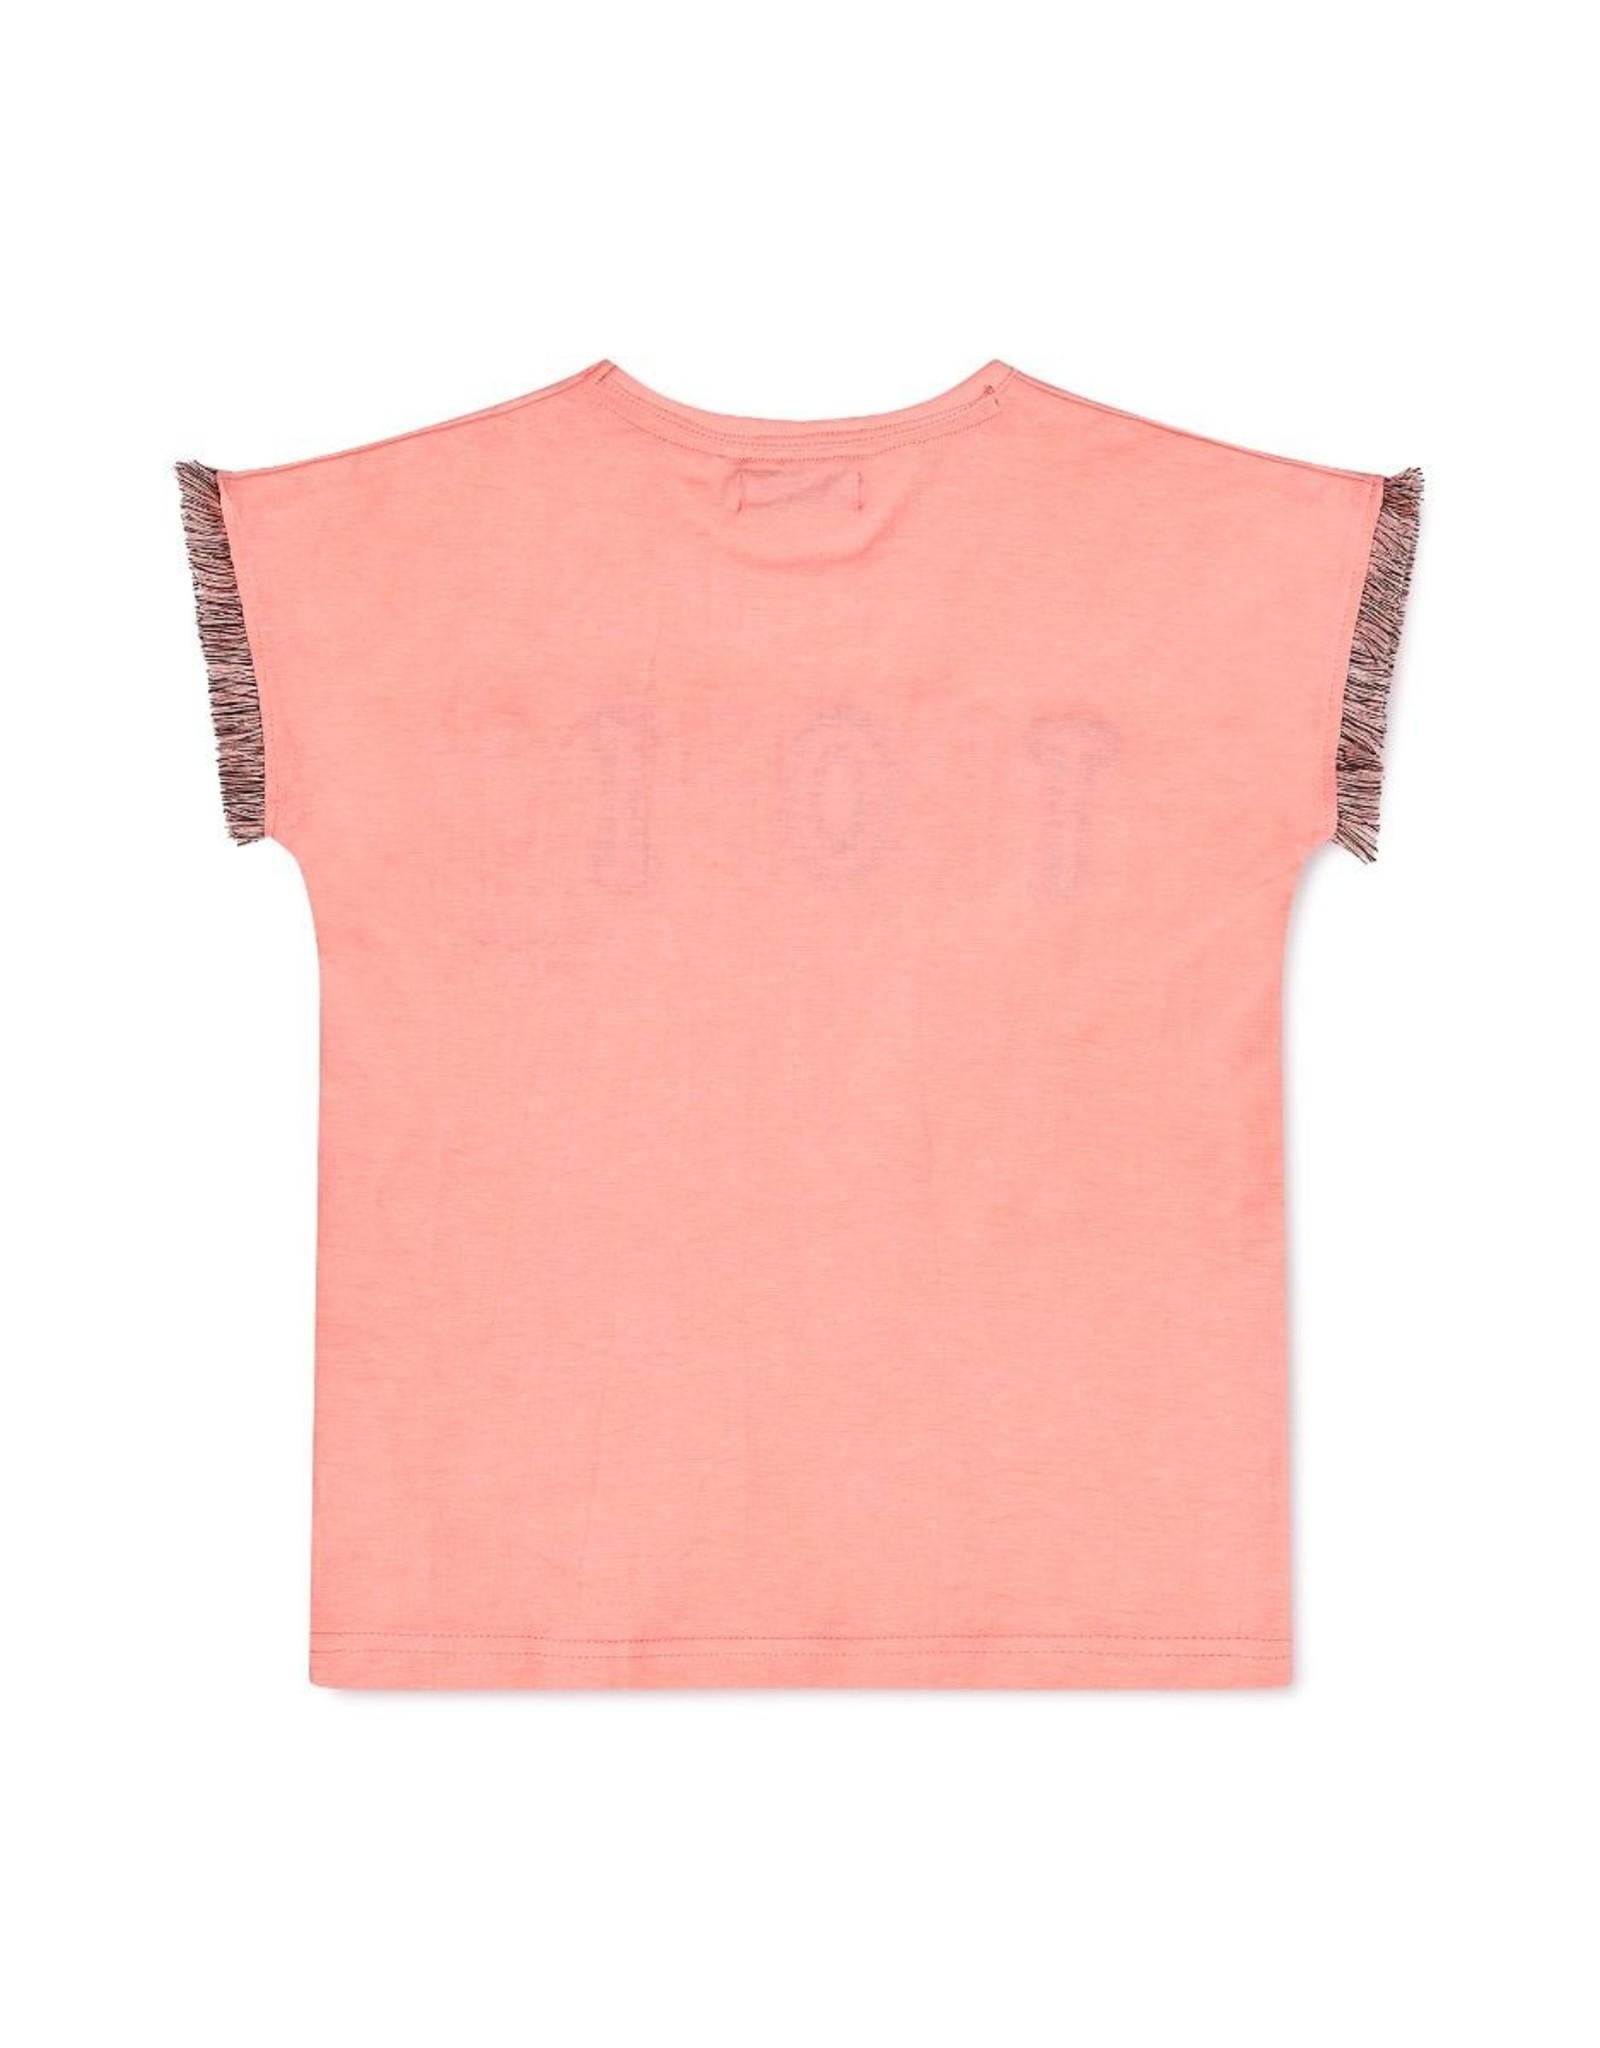 DJ Dutchjeans DJ Dutchjeans shirt 38087 light neon coral